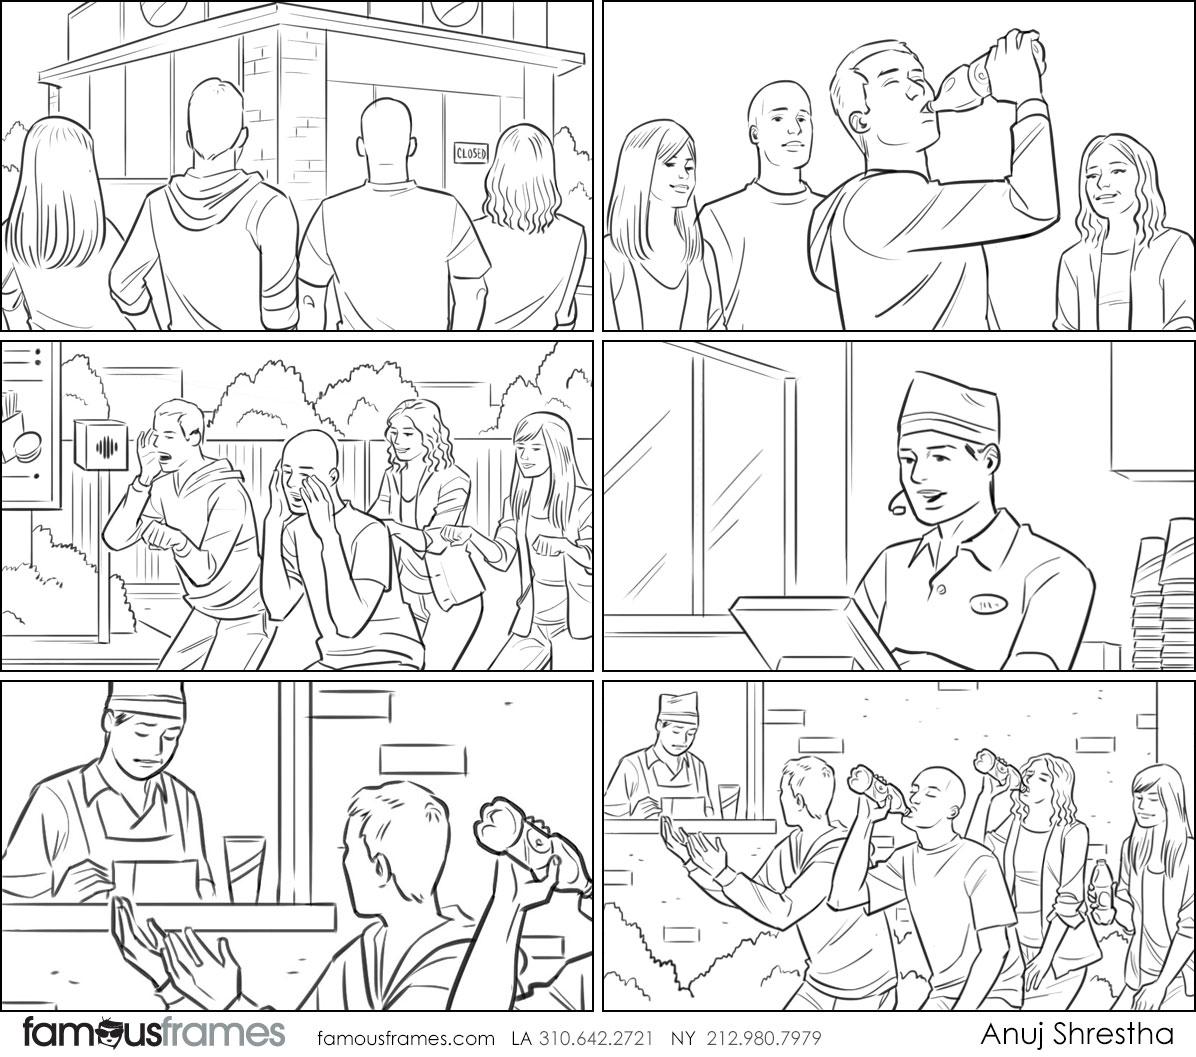 Anuj Shrestha's People - B&W Line storyboard art (Image #1009_114_1495156104)